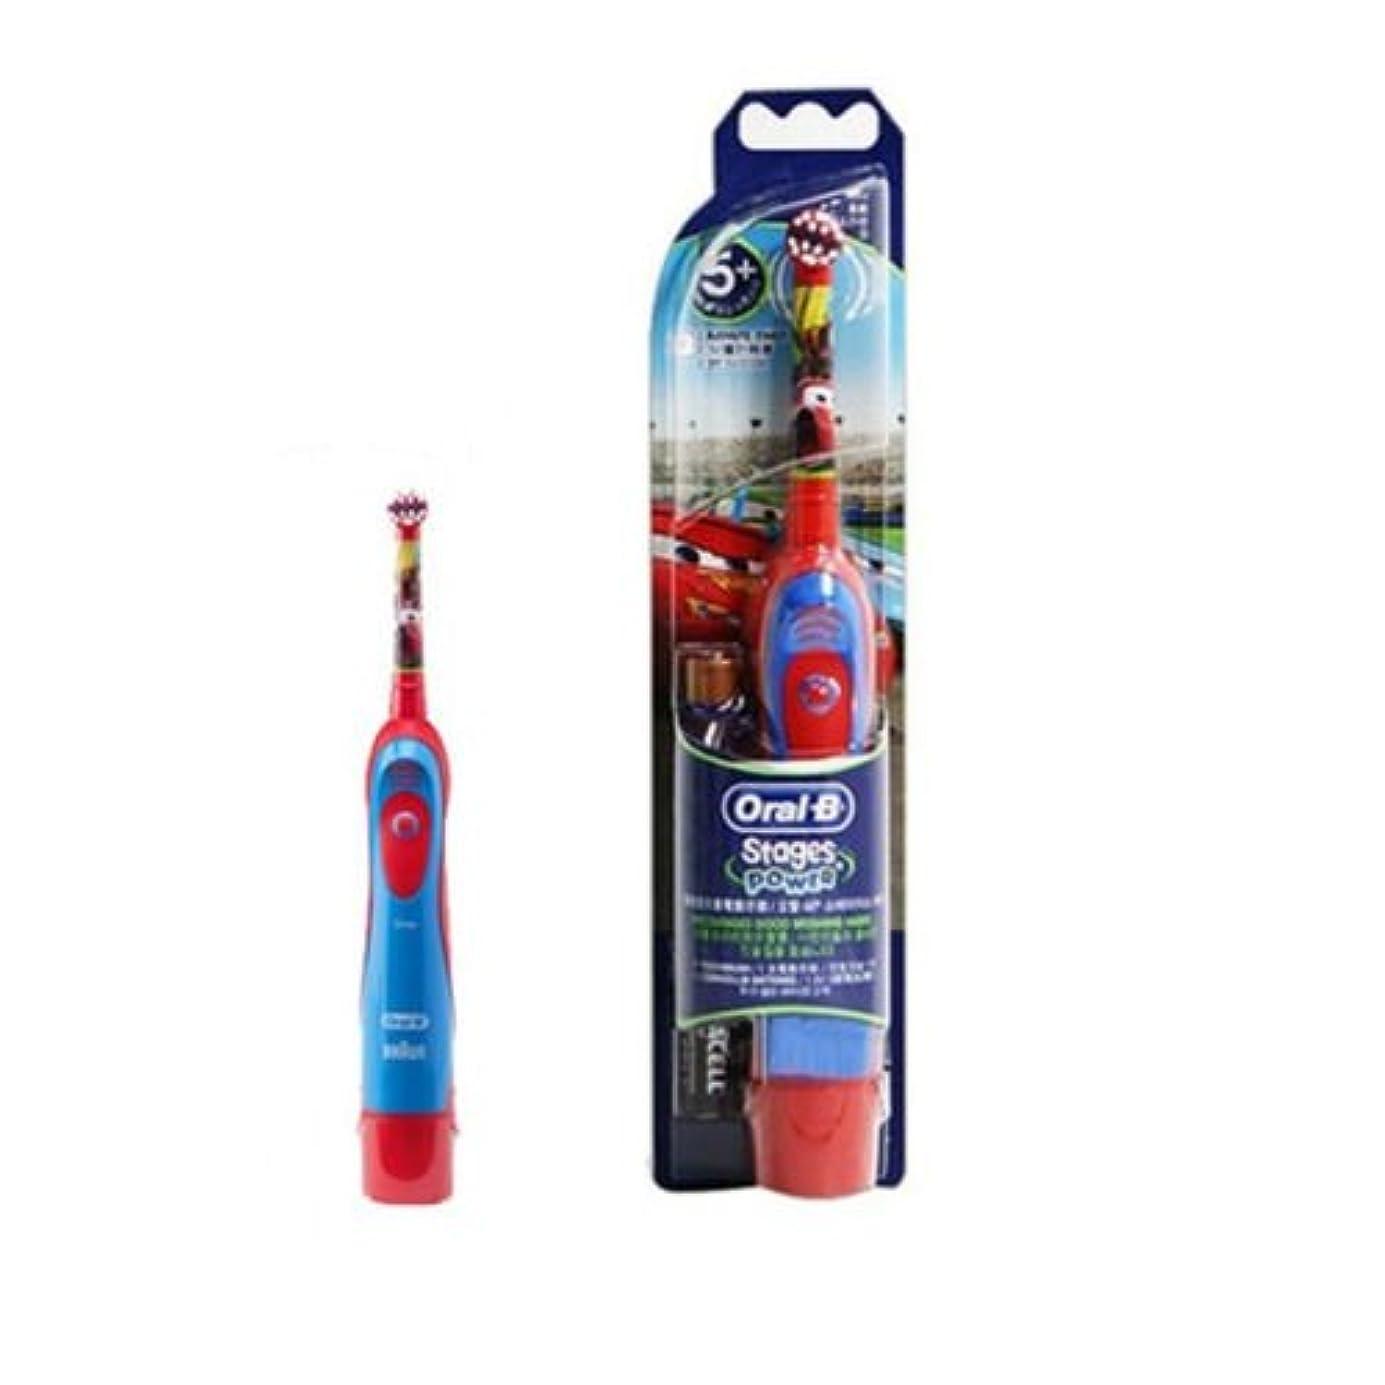 抑圧者十分な溶融Braun Oral-B D2 D2010 Disney Car Kids 電動歯ブラシ [並行輸入品]